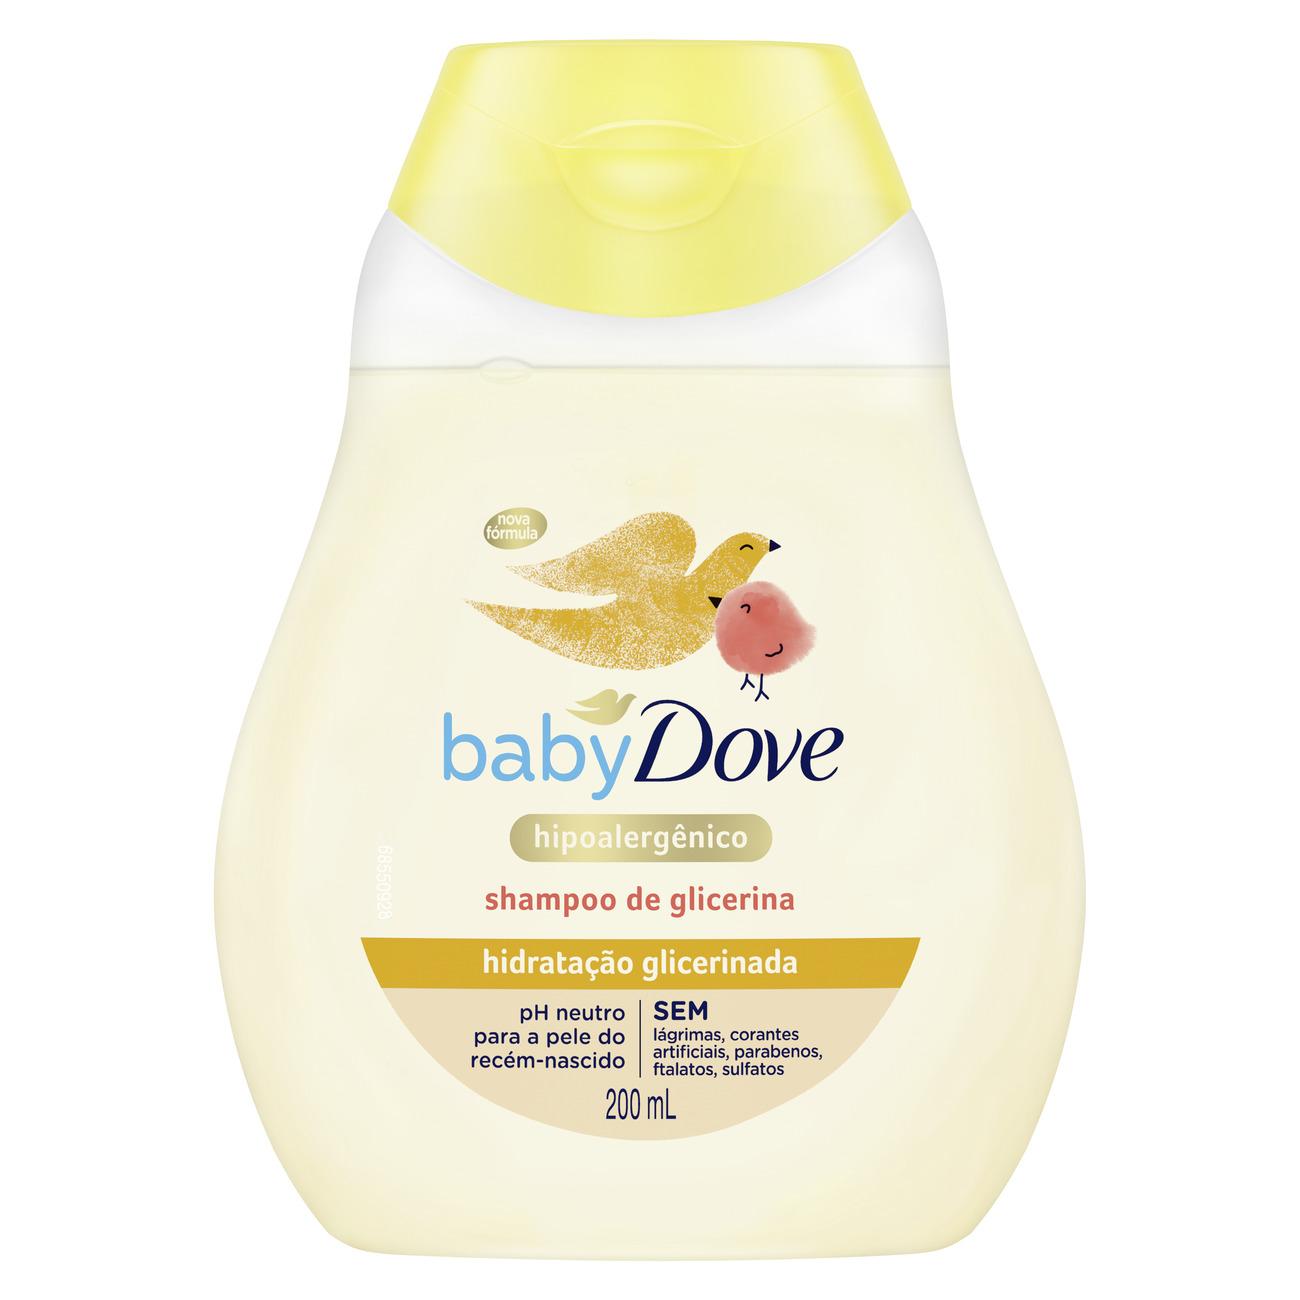 Shampoo de Glicerina Baby Dove Hidratação Glicerinada 200mL